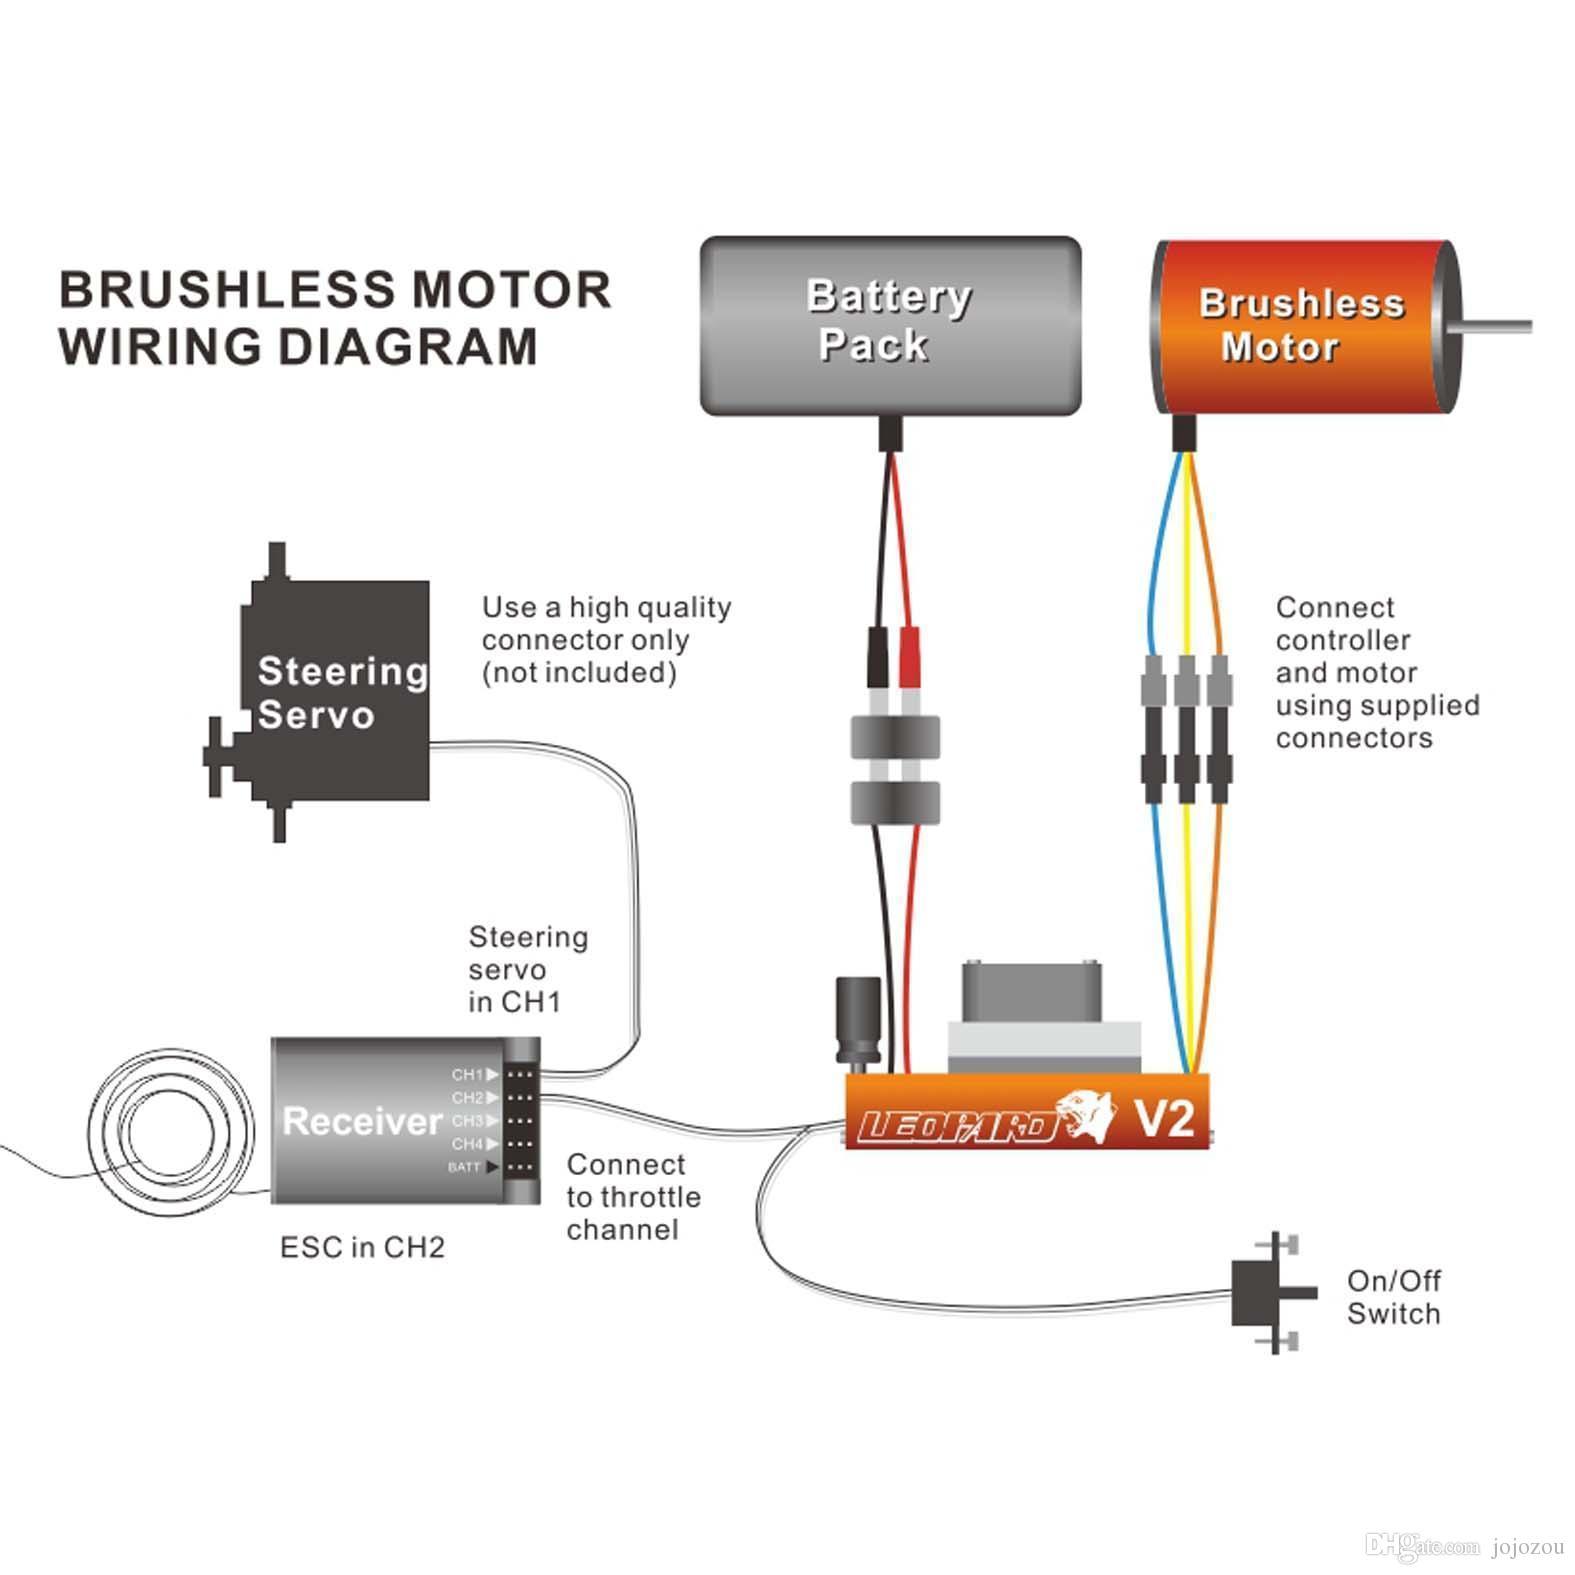 rc 10 wiring diagram schematic diagram Electric RC Car Wiring Diagram rc 10 wiring diagram wiring diagram wiring rc planes rc 10 wiring diagram wiring diagramrc car